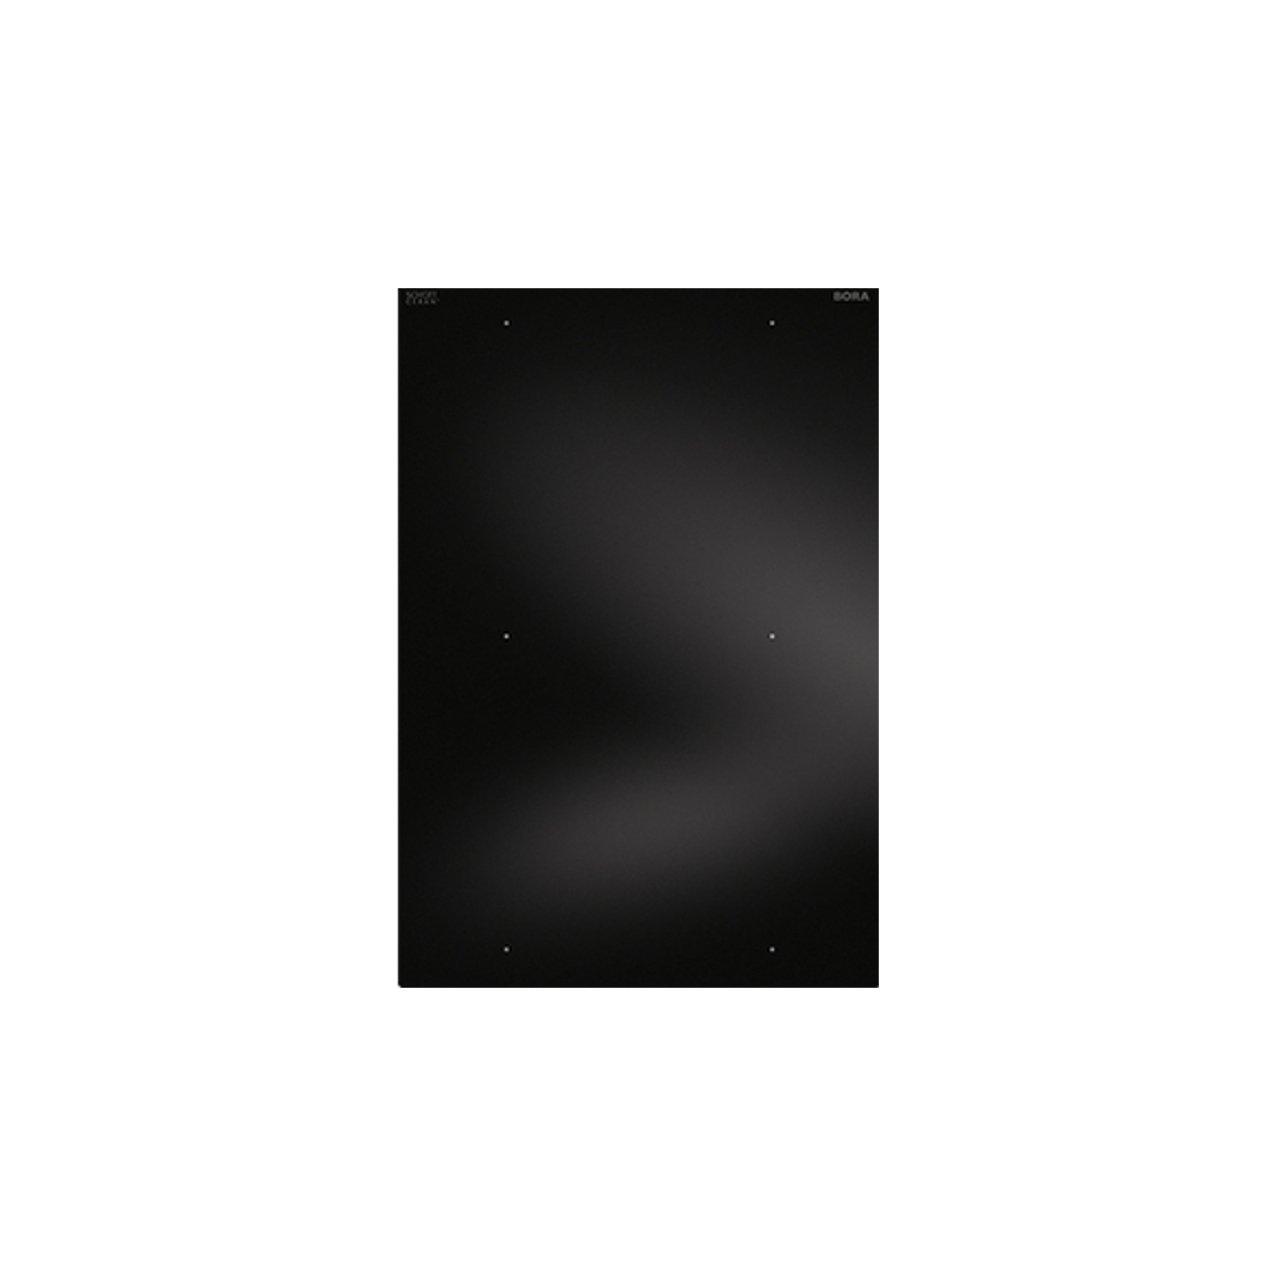 p yta kuchenna bora professional pfi11 globalo max. Black Bedroom Furniture Sets. Home Design Ideas